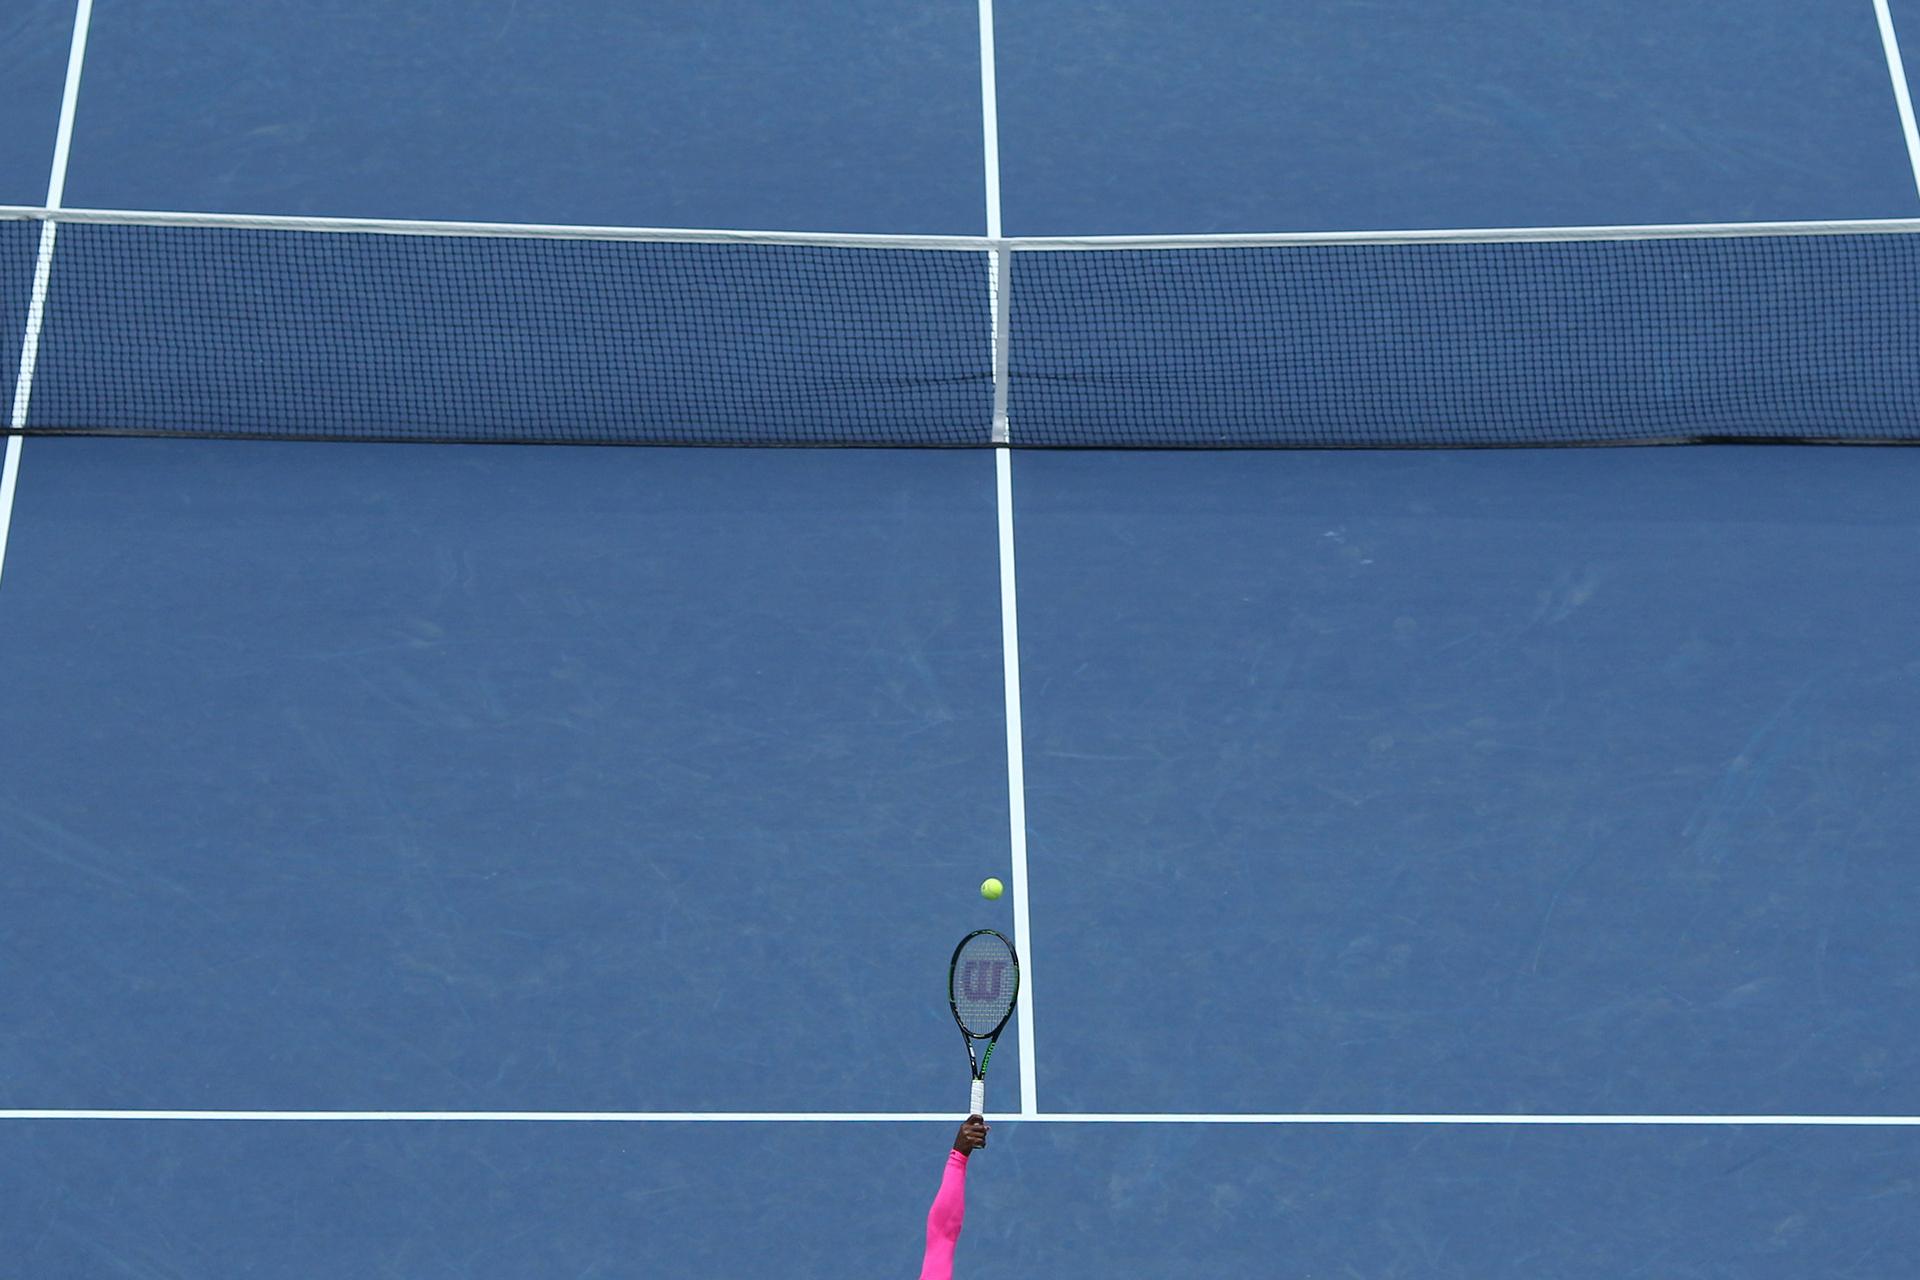 040916_Tennis_USOpen_3874